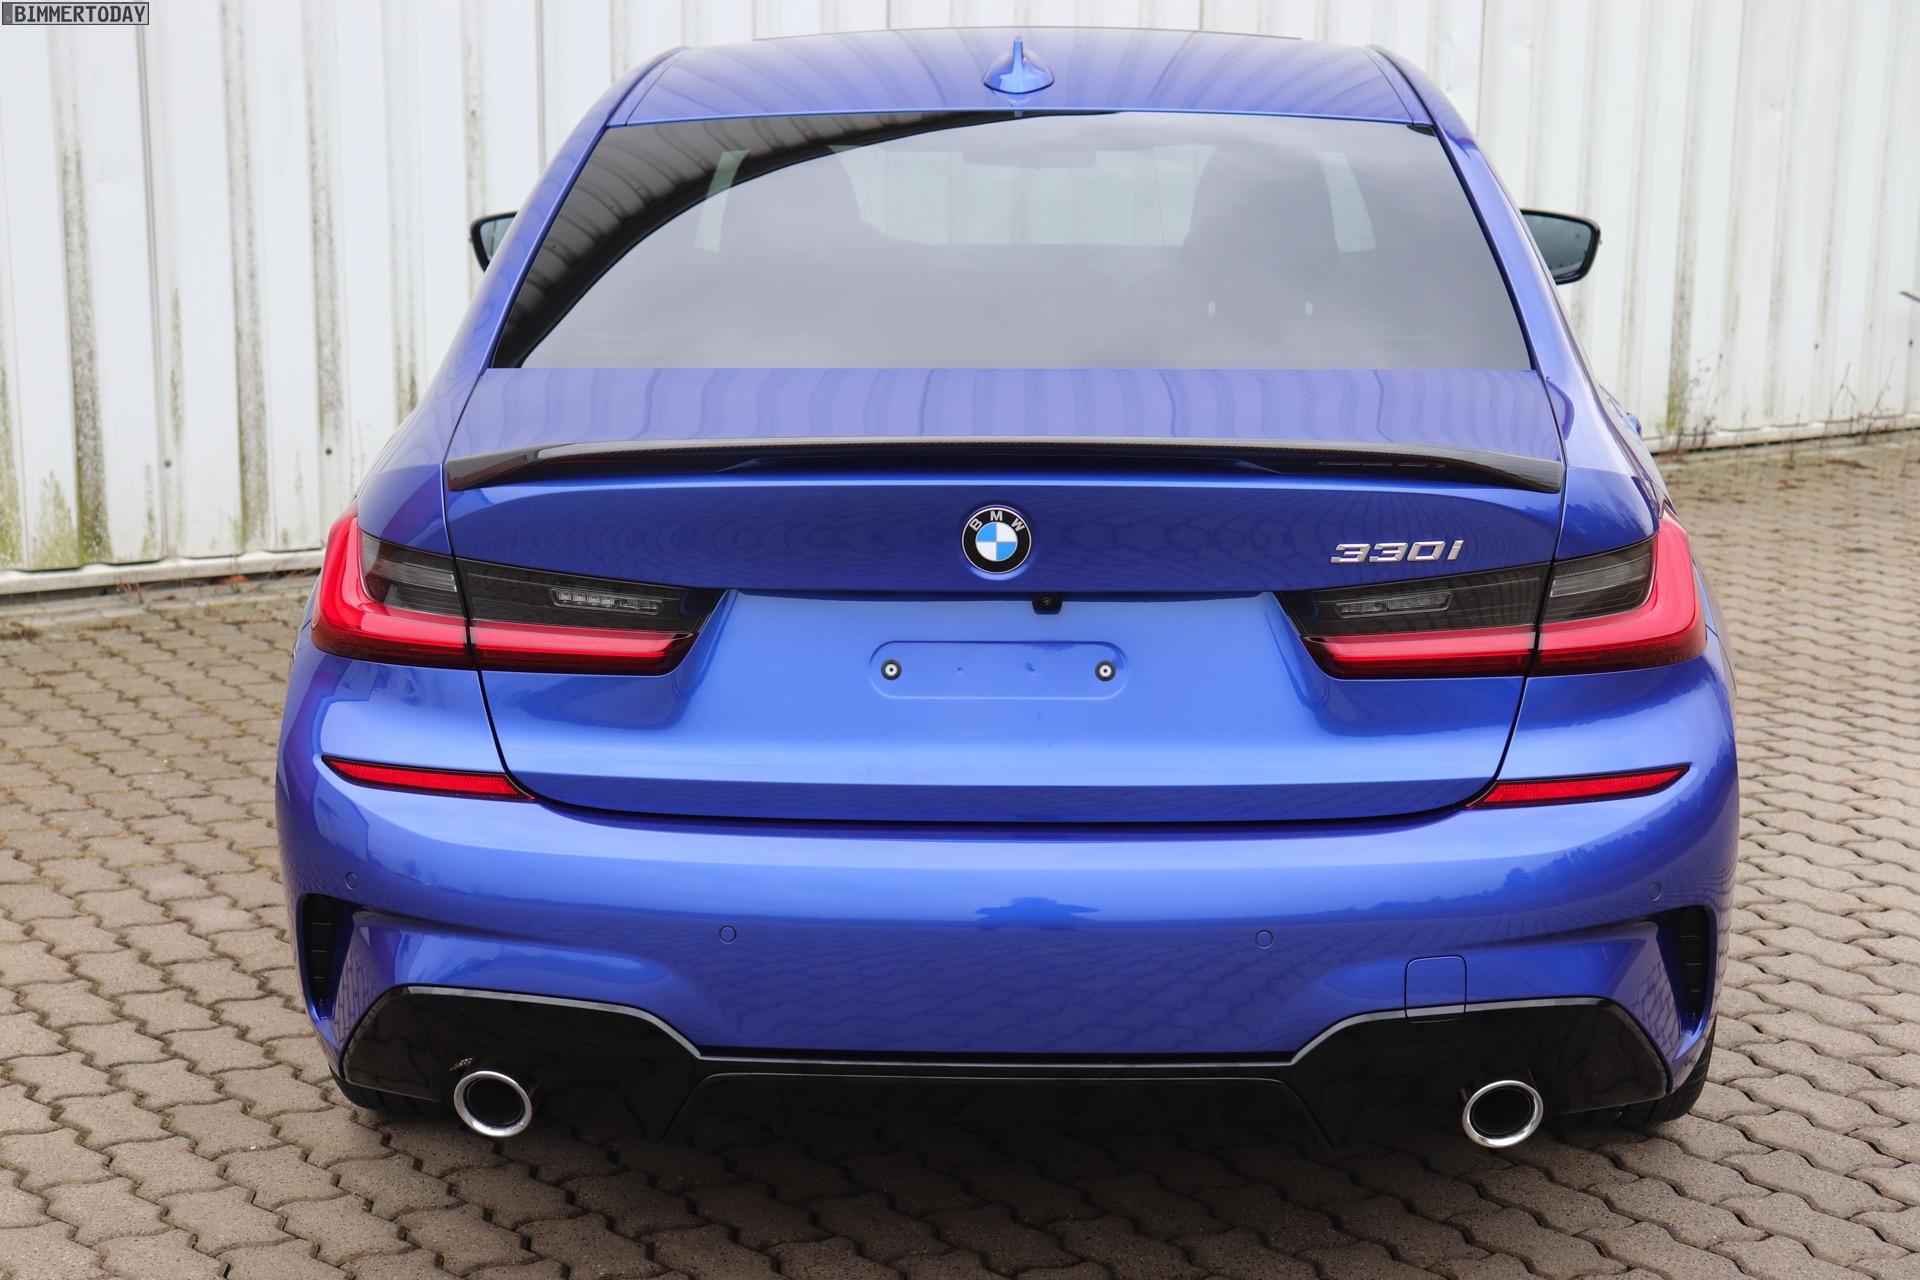 Name:  2019-BMW-330i-G20-M-Performance-Parts-1.jpg2019-BMW-330i-G20-M-Performance-Parts-1.jpg2019-BMW-3.jpg Views: 5340 Size:  455.8 KB